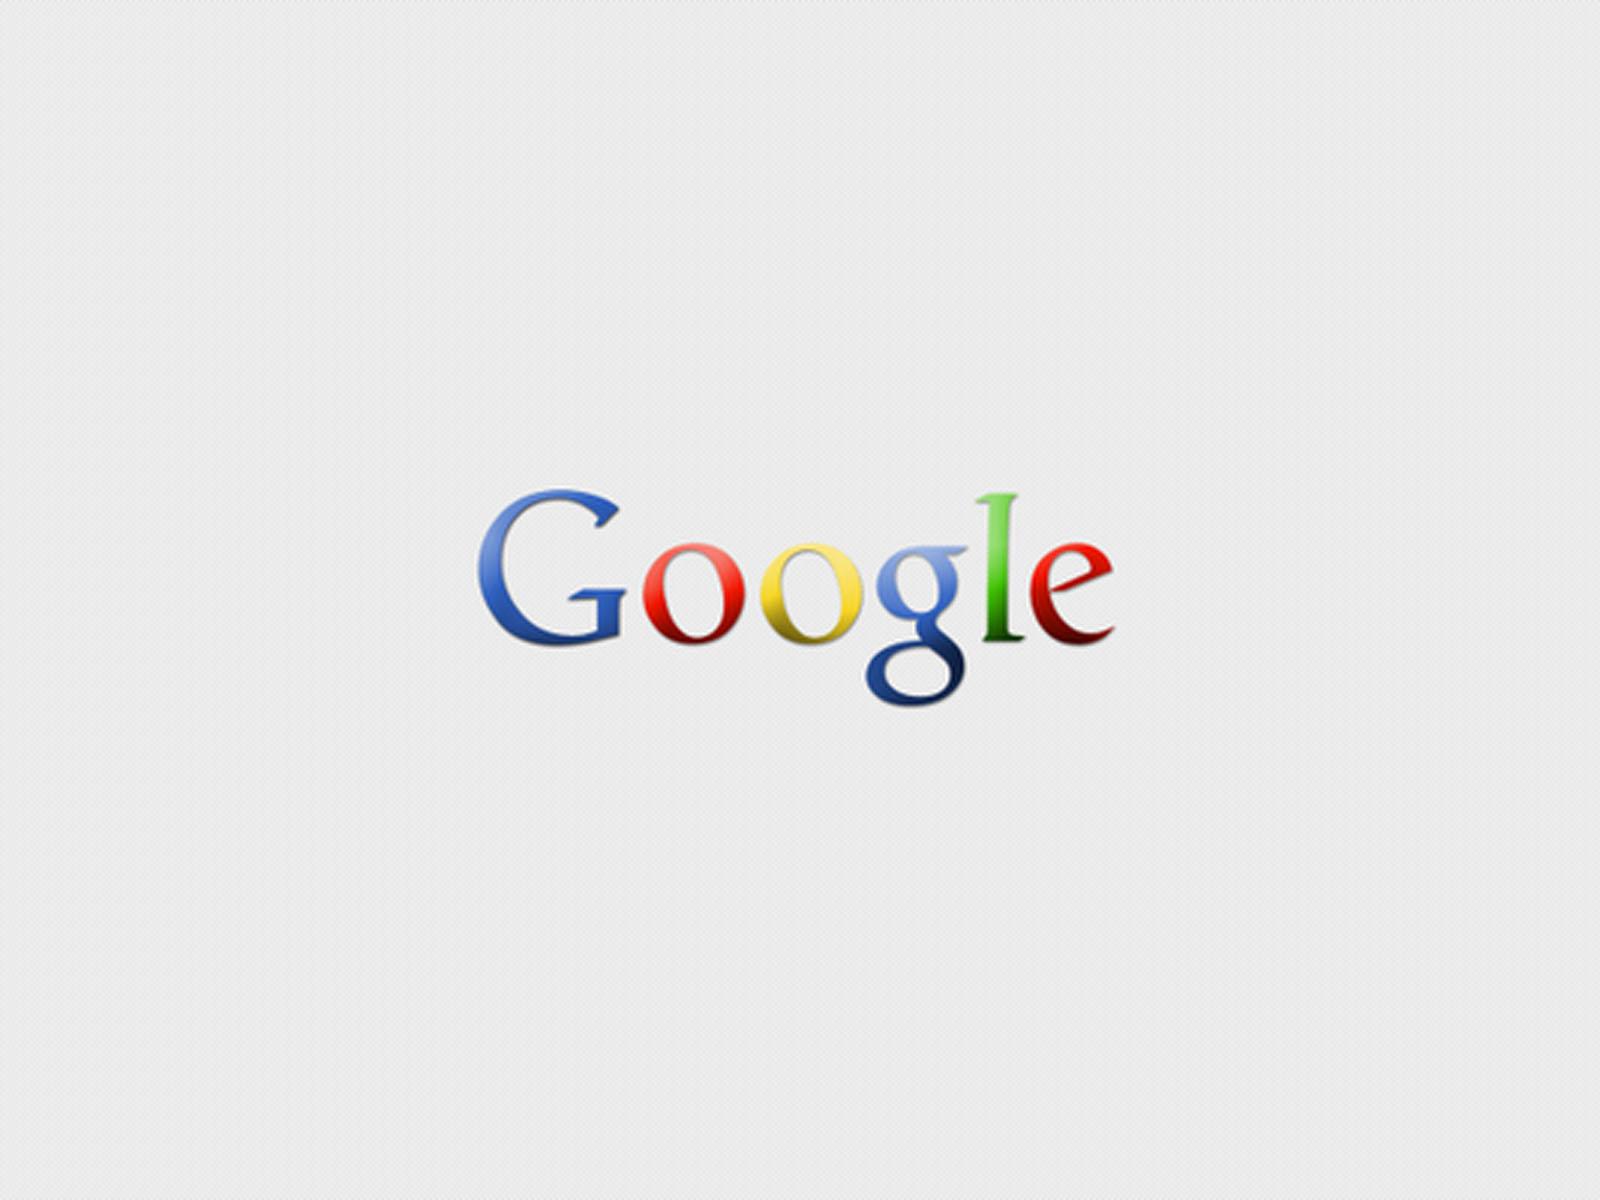 google - photo #28